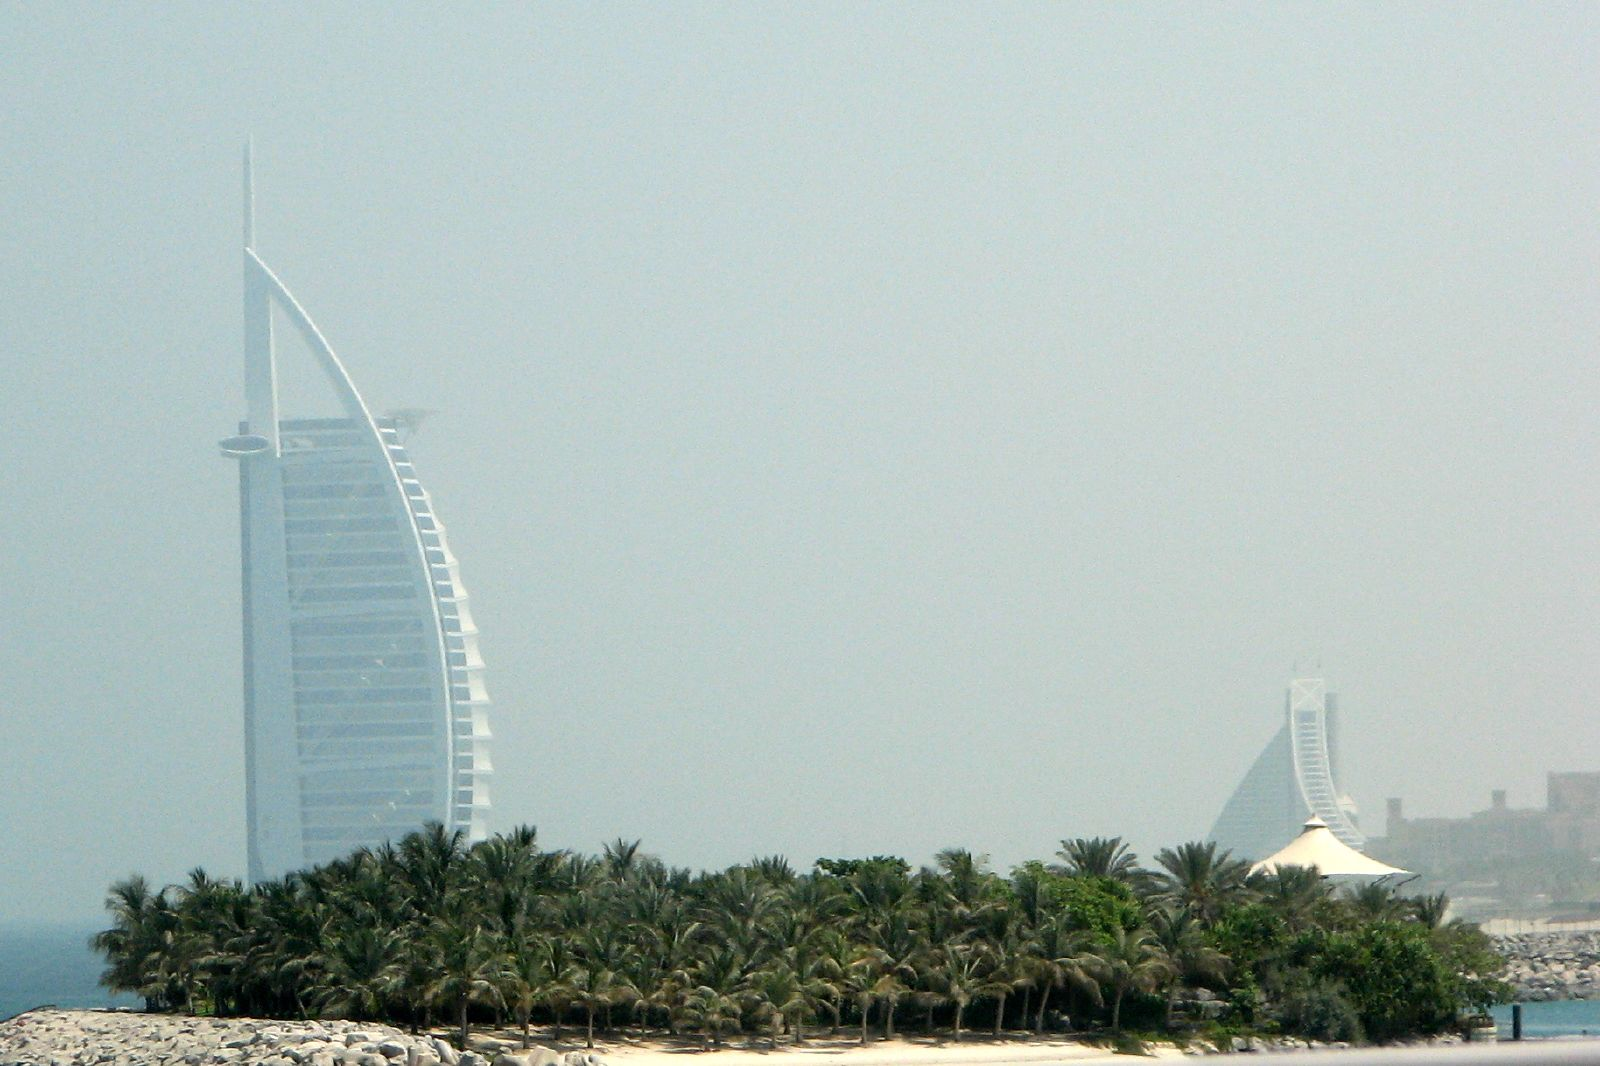 Burj Al Arab Burj Al Arab The Signature Building Of